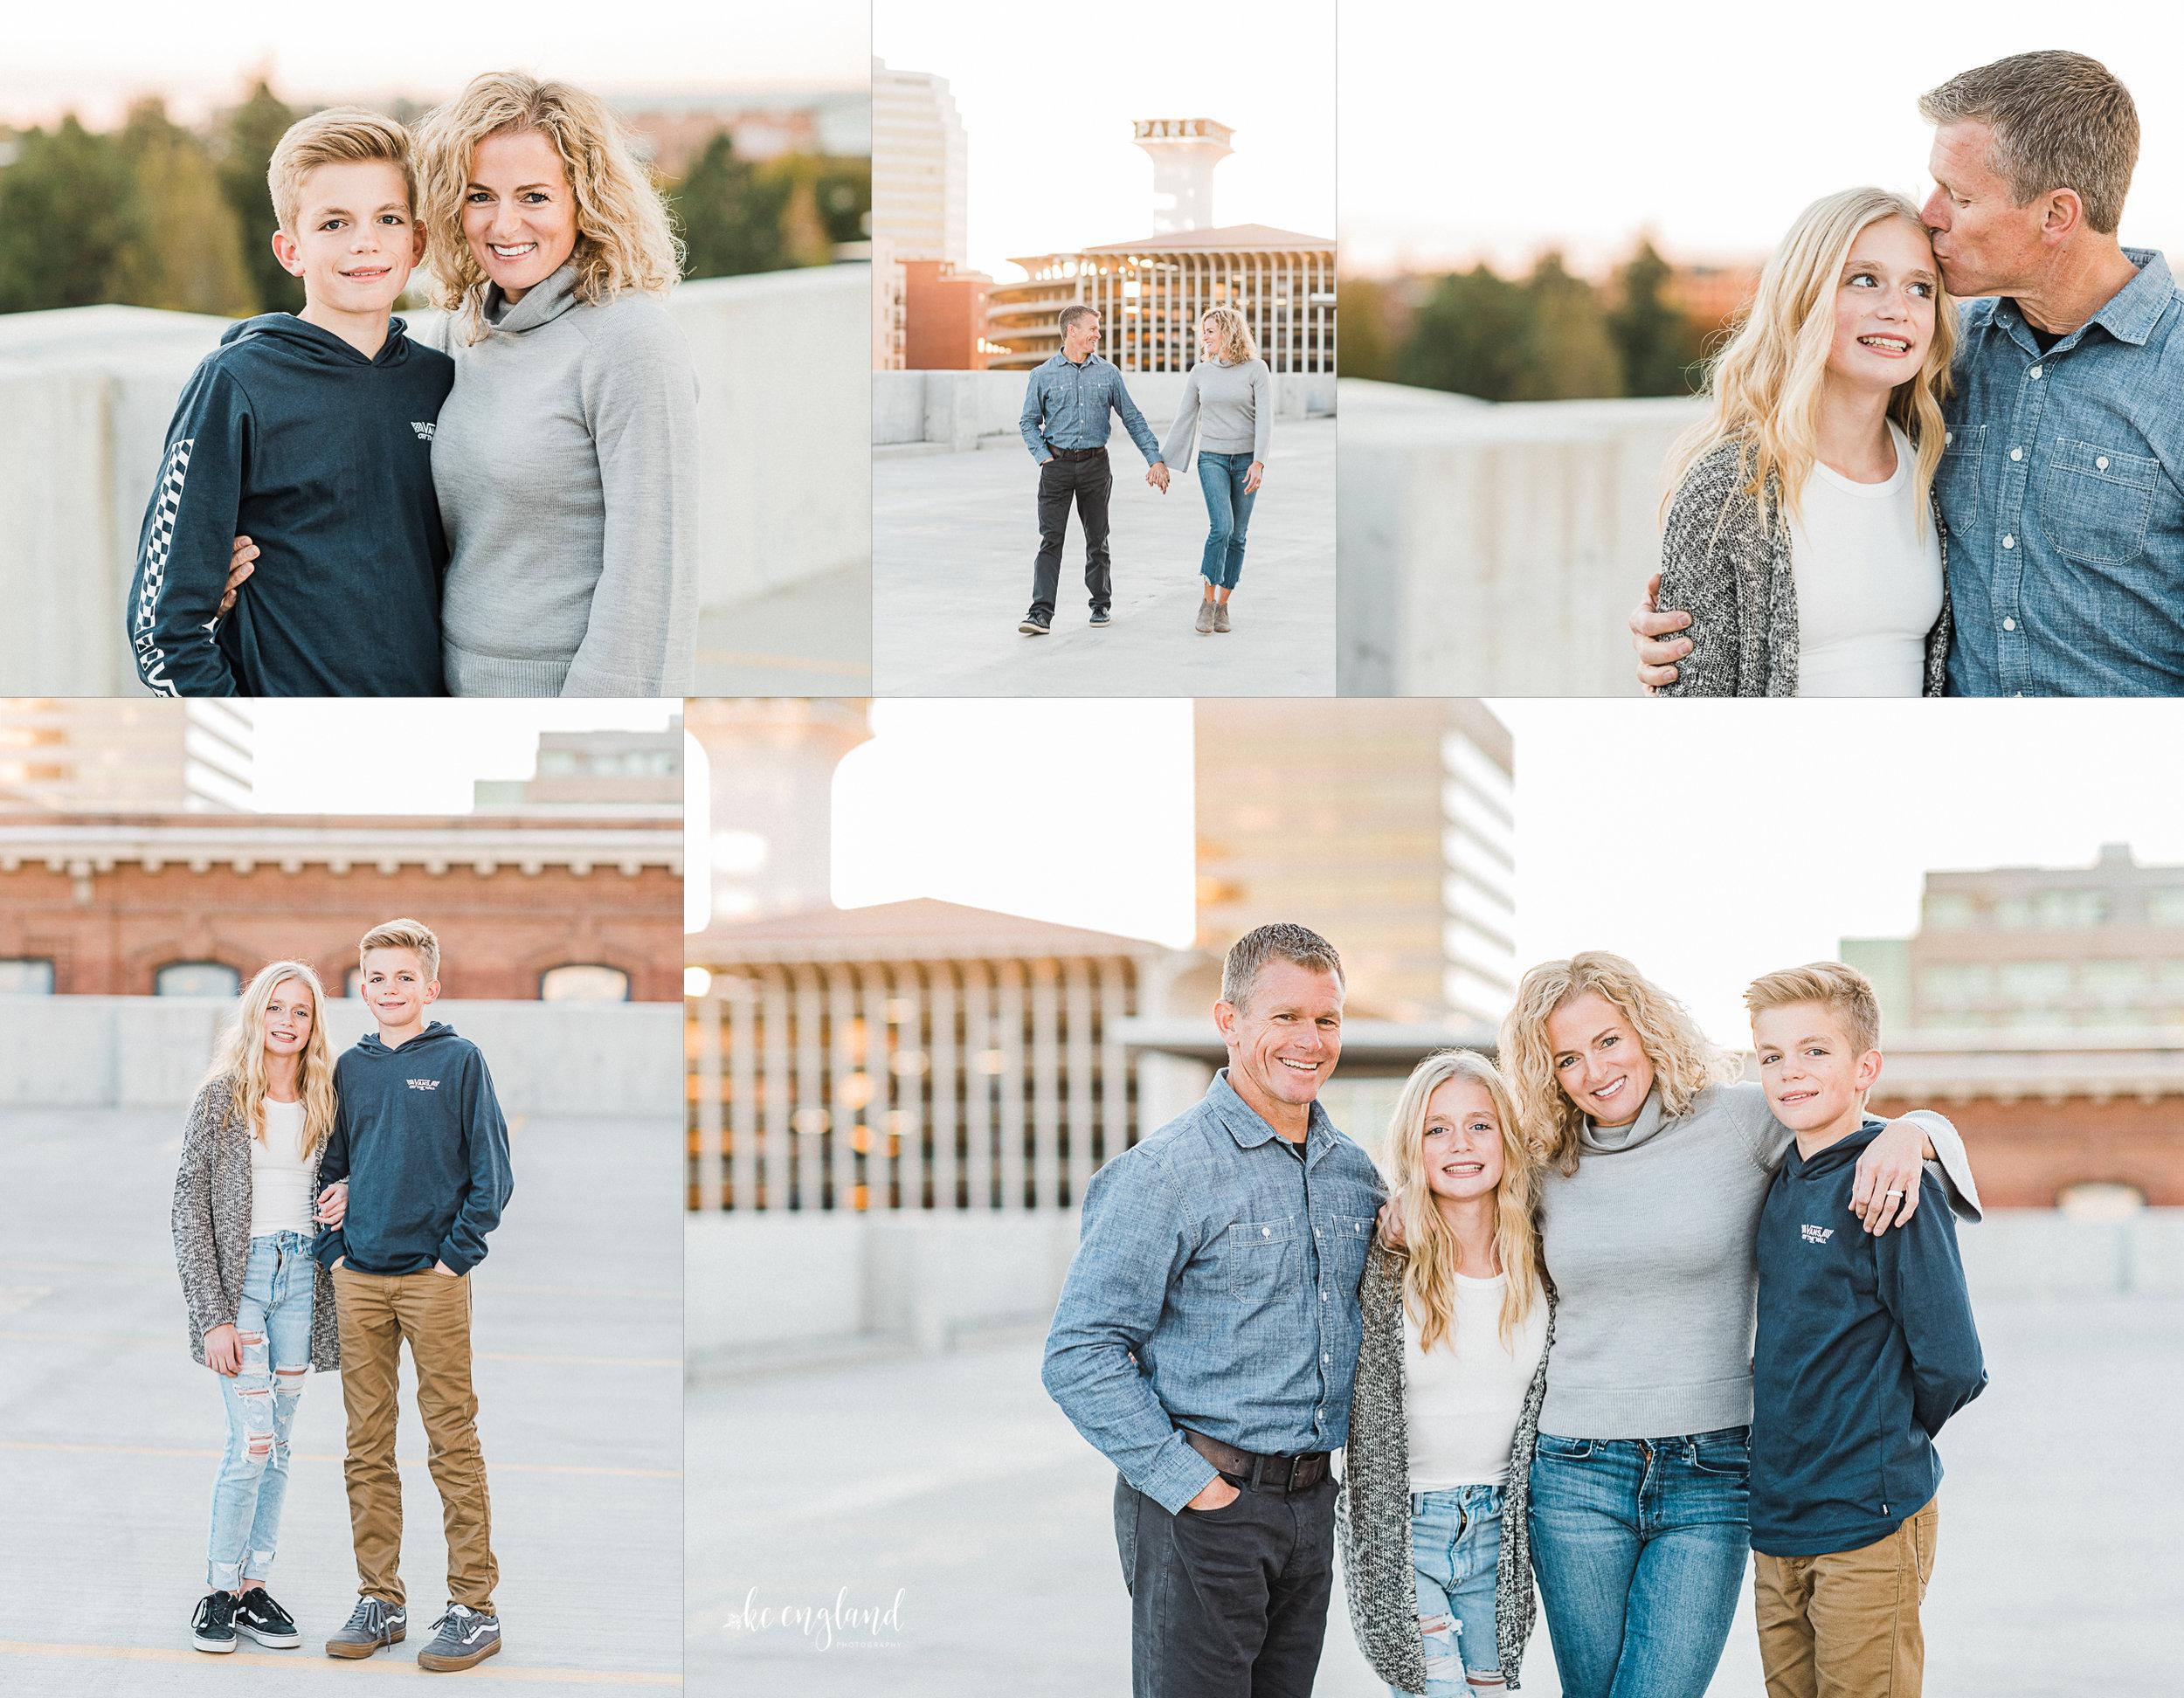 fall_urban_family_session_spokane_wa